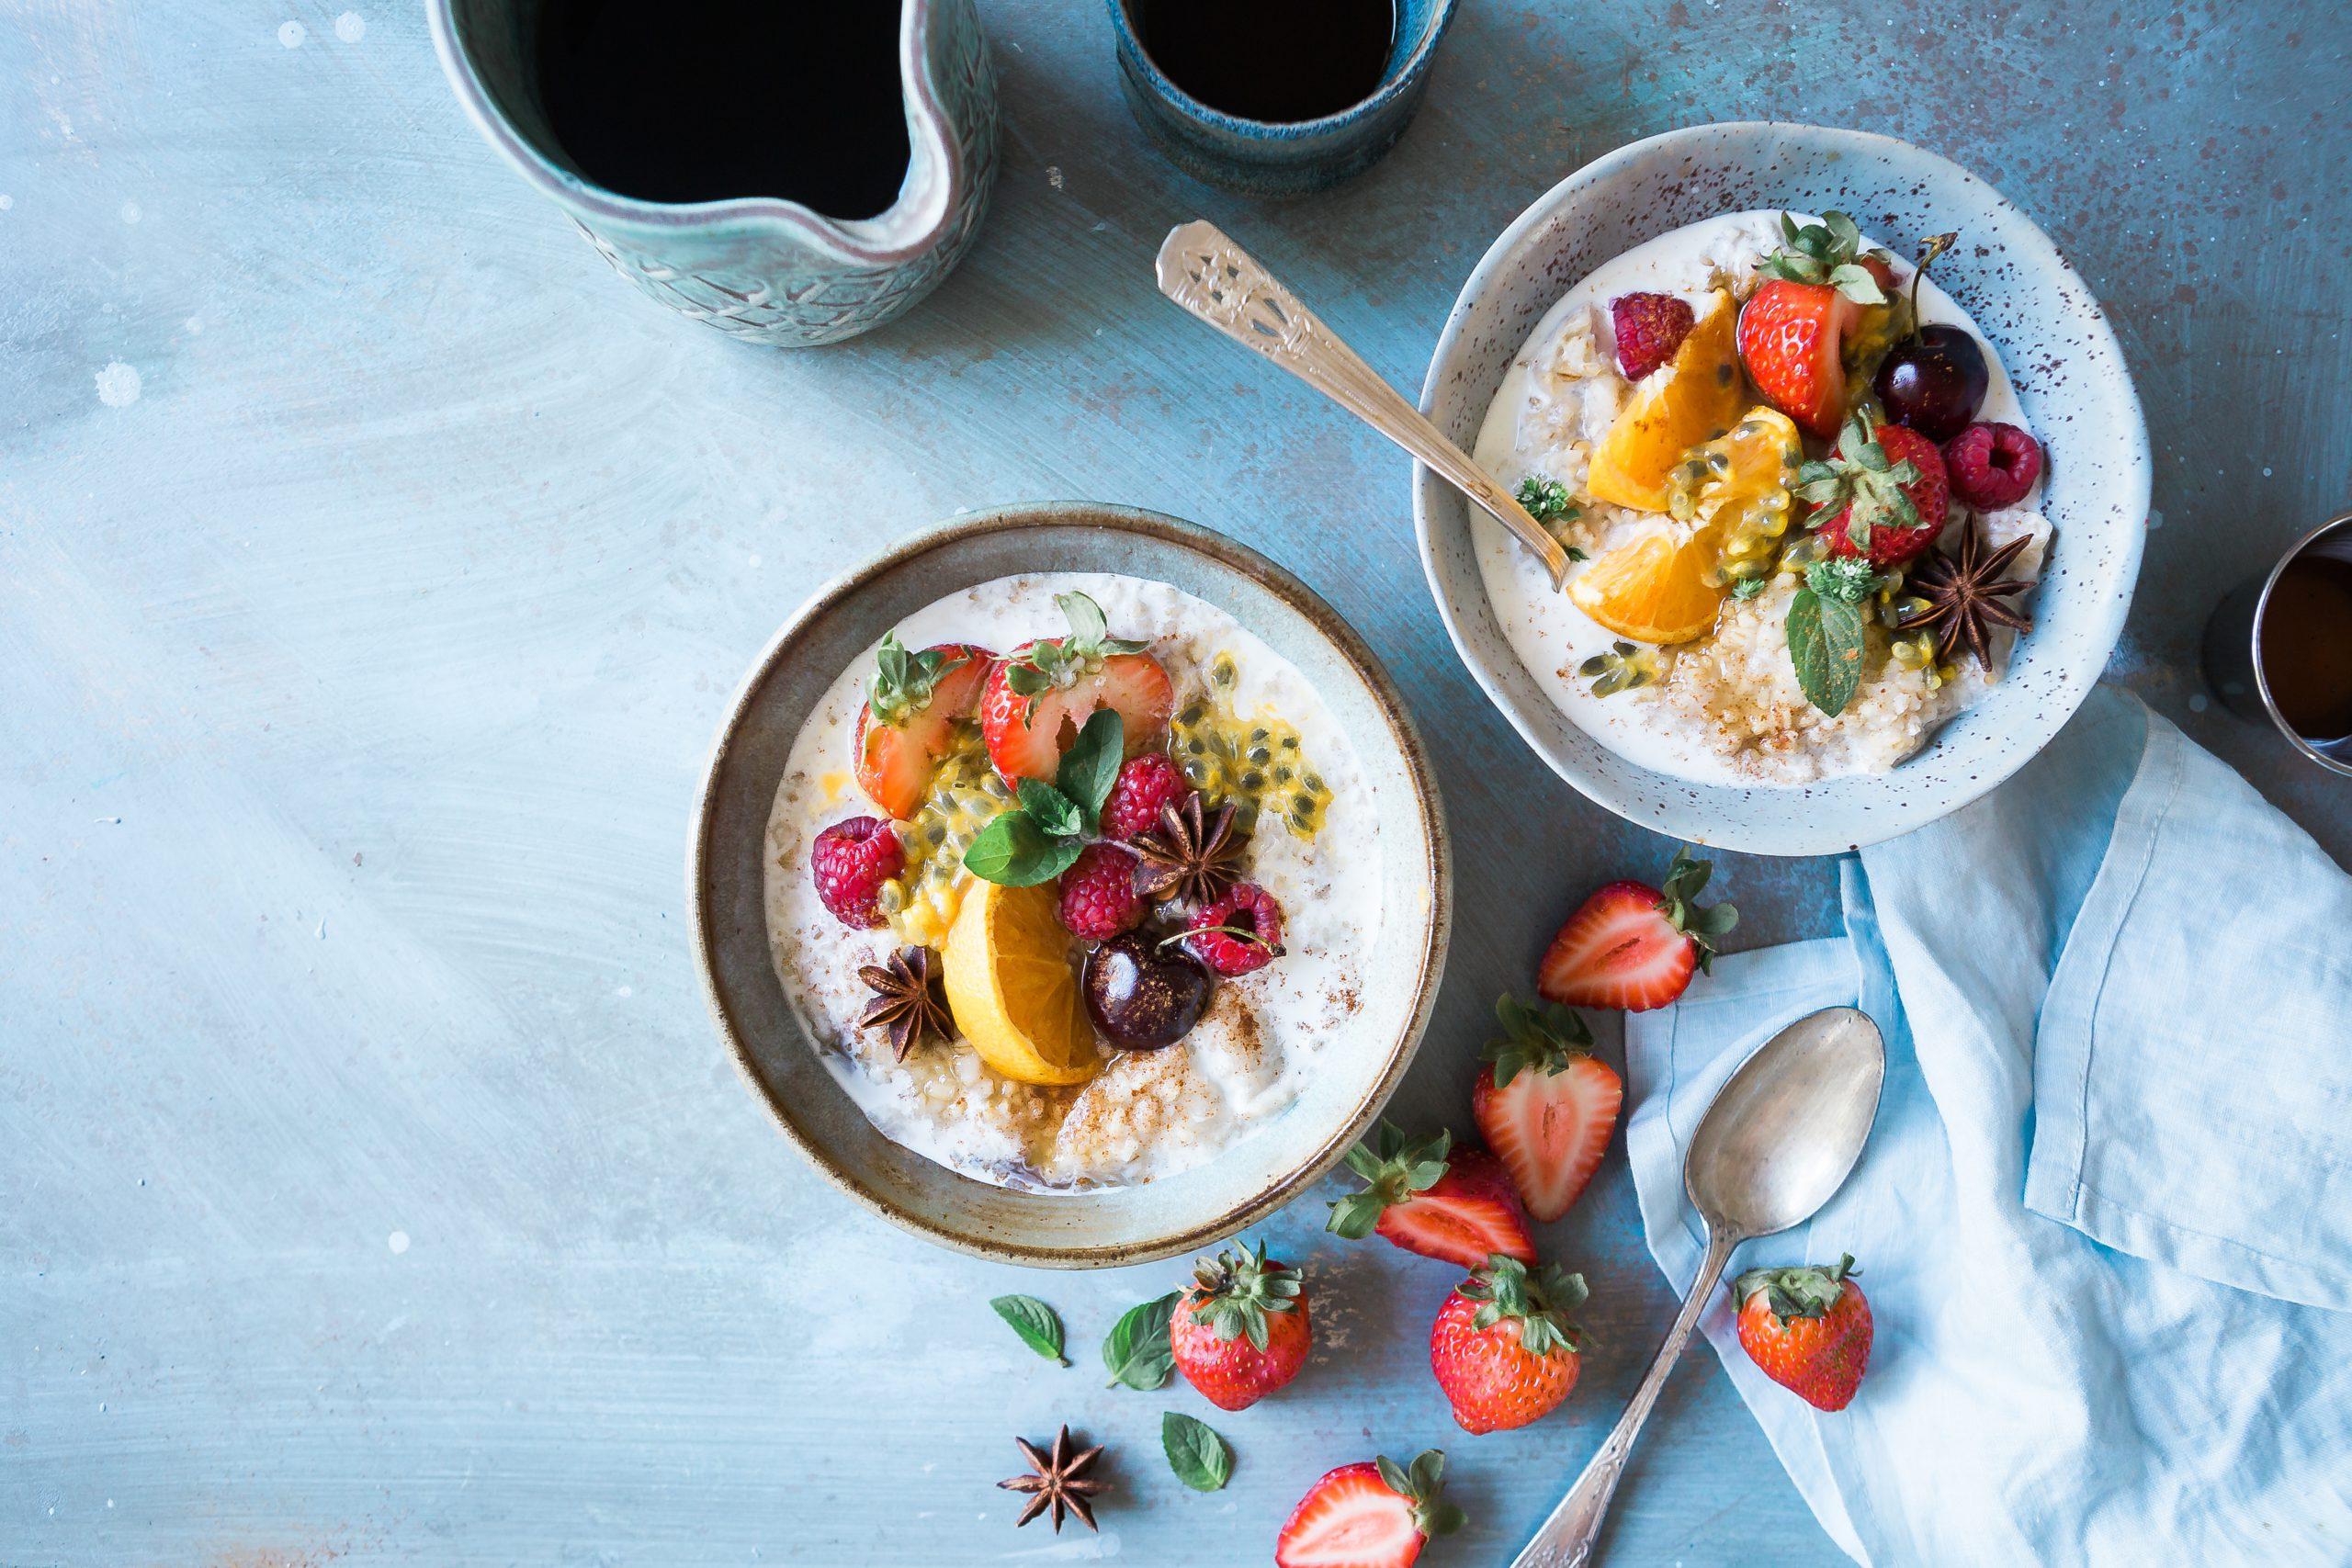 dieta saludable ahora neta